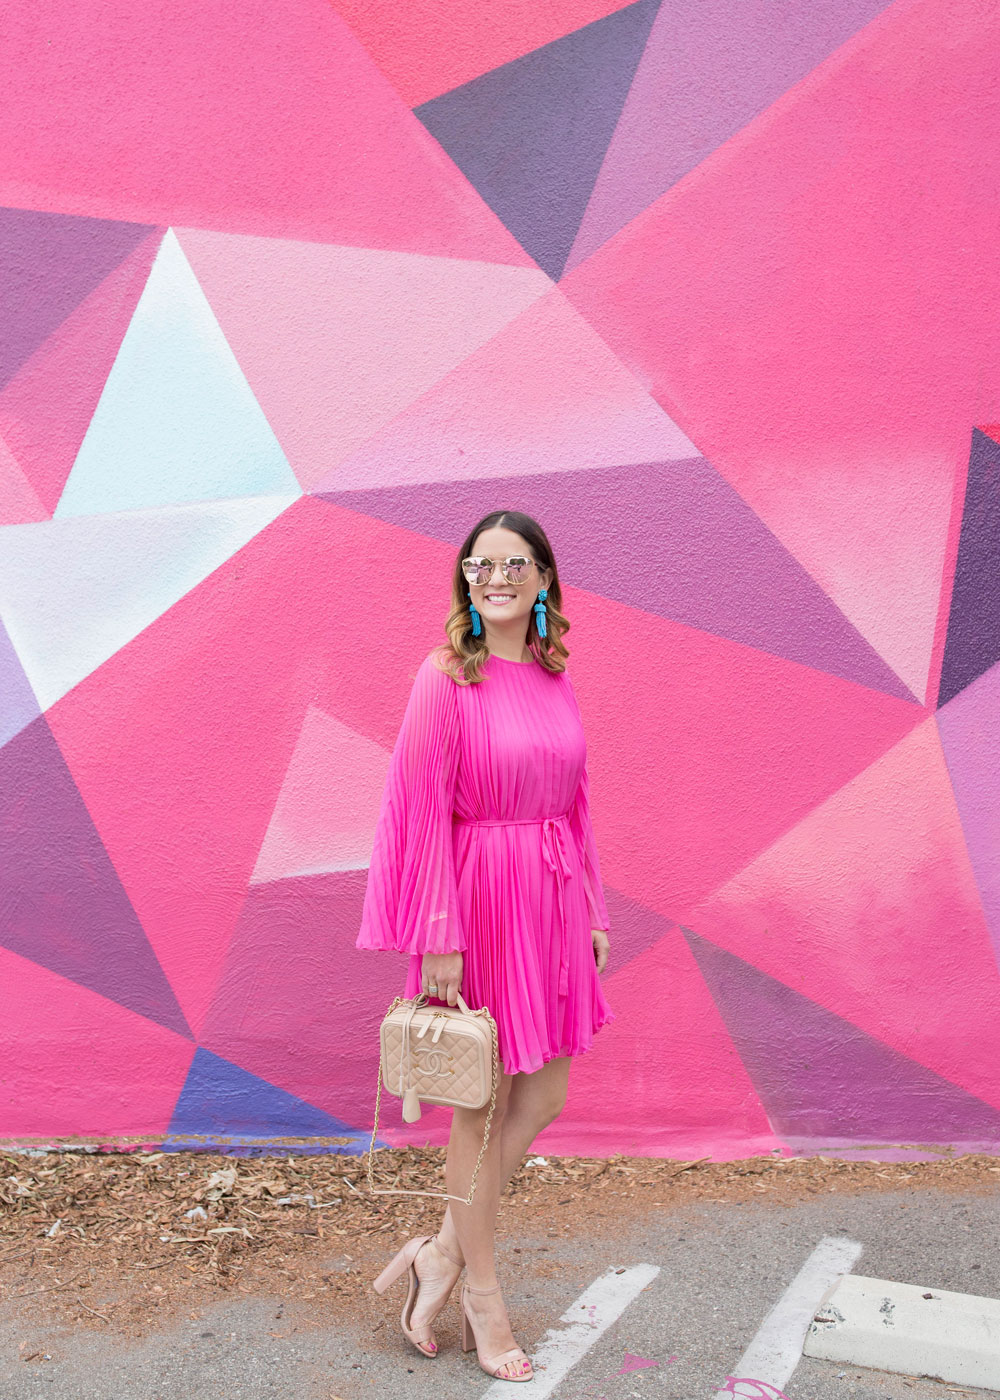 Venice Pink Wall